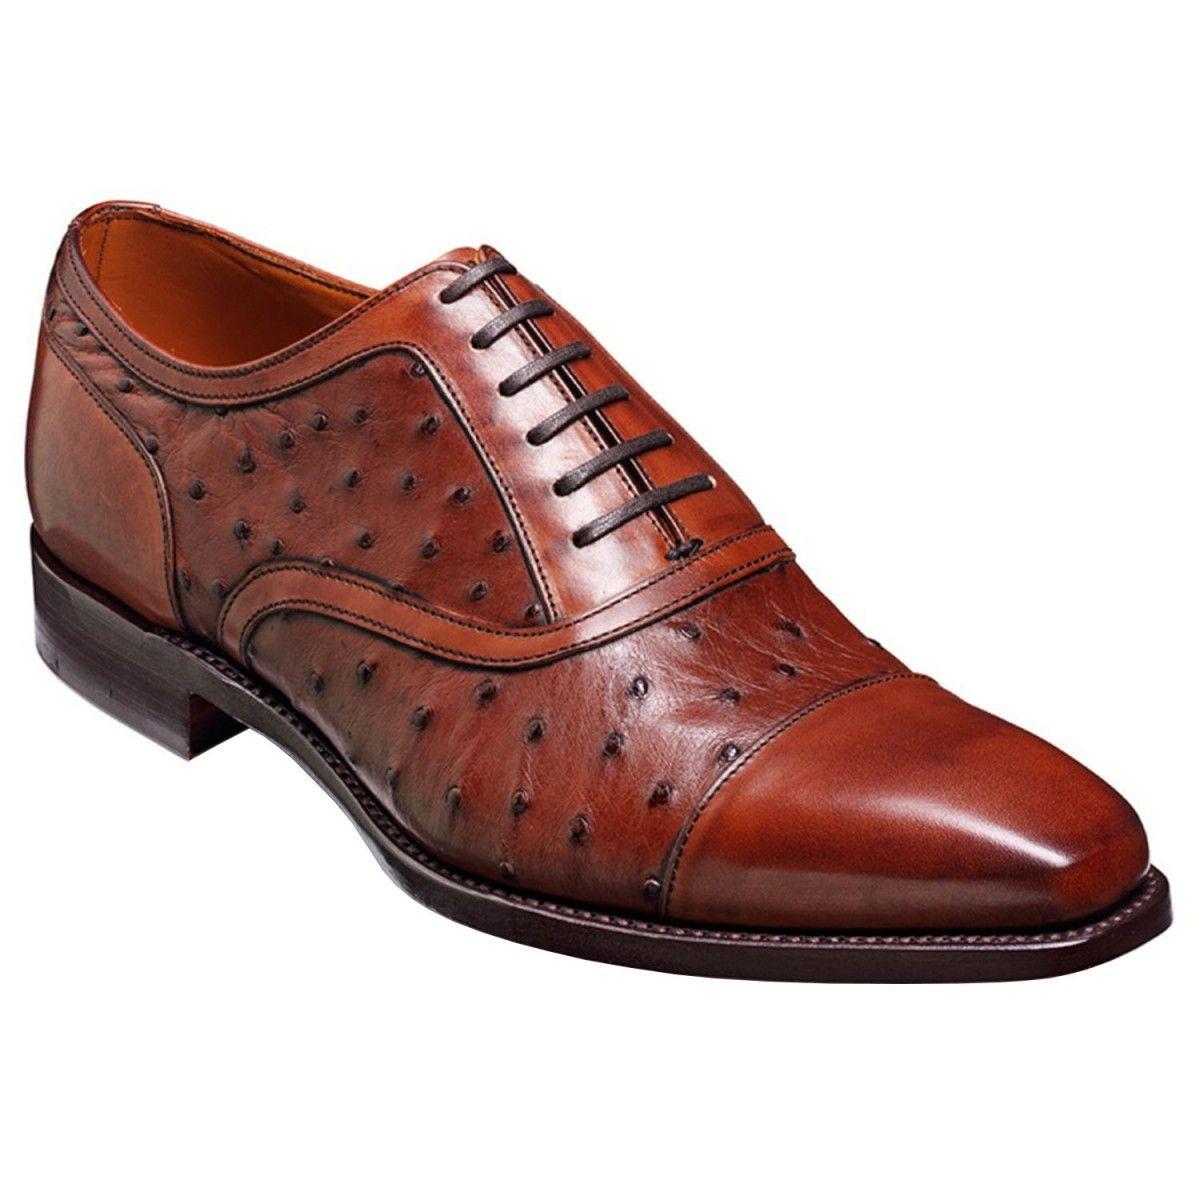 barker shoes near me